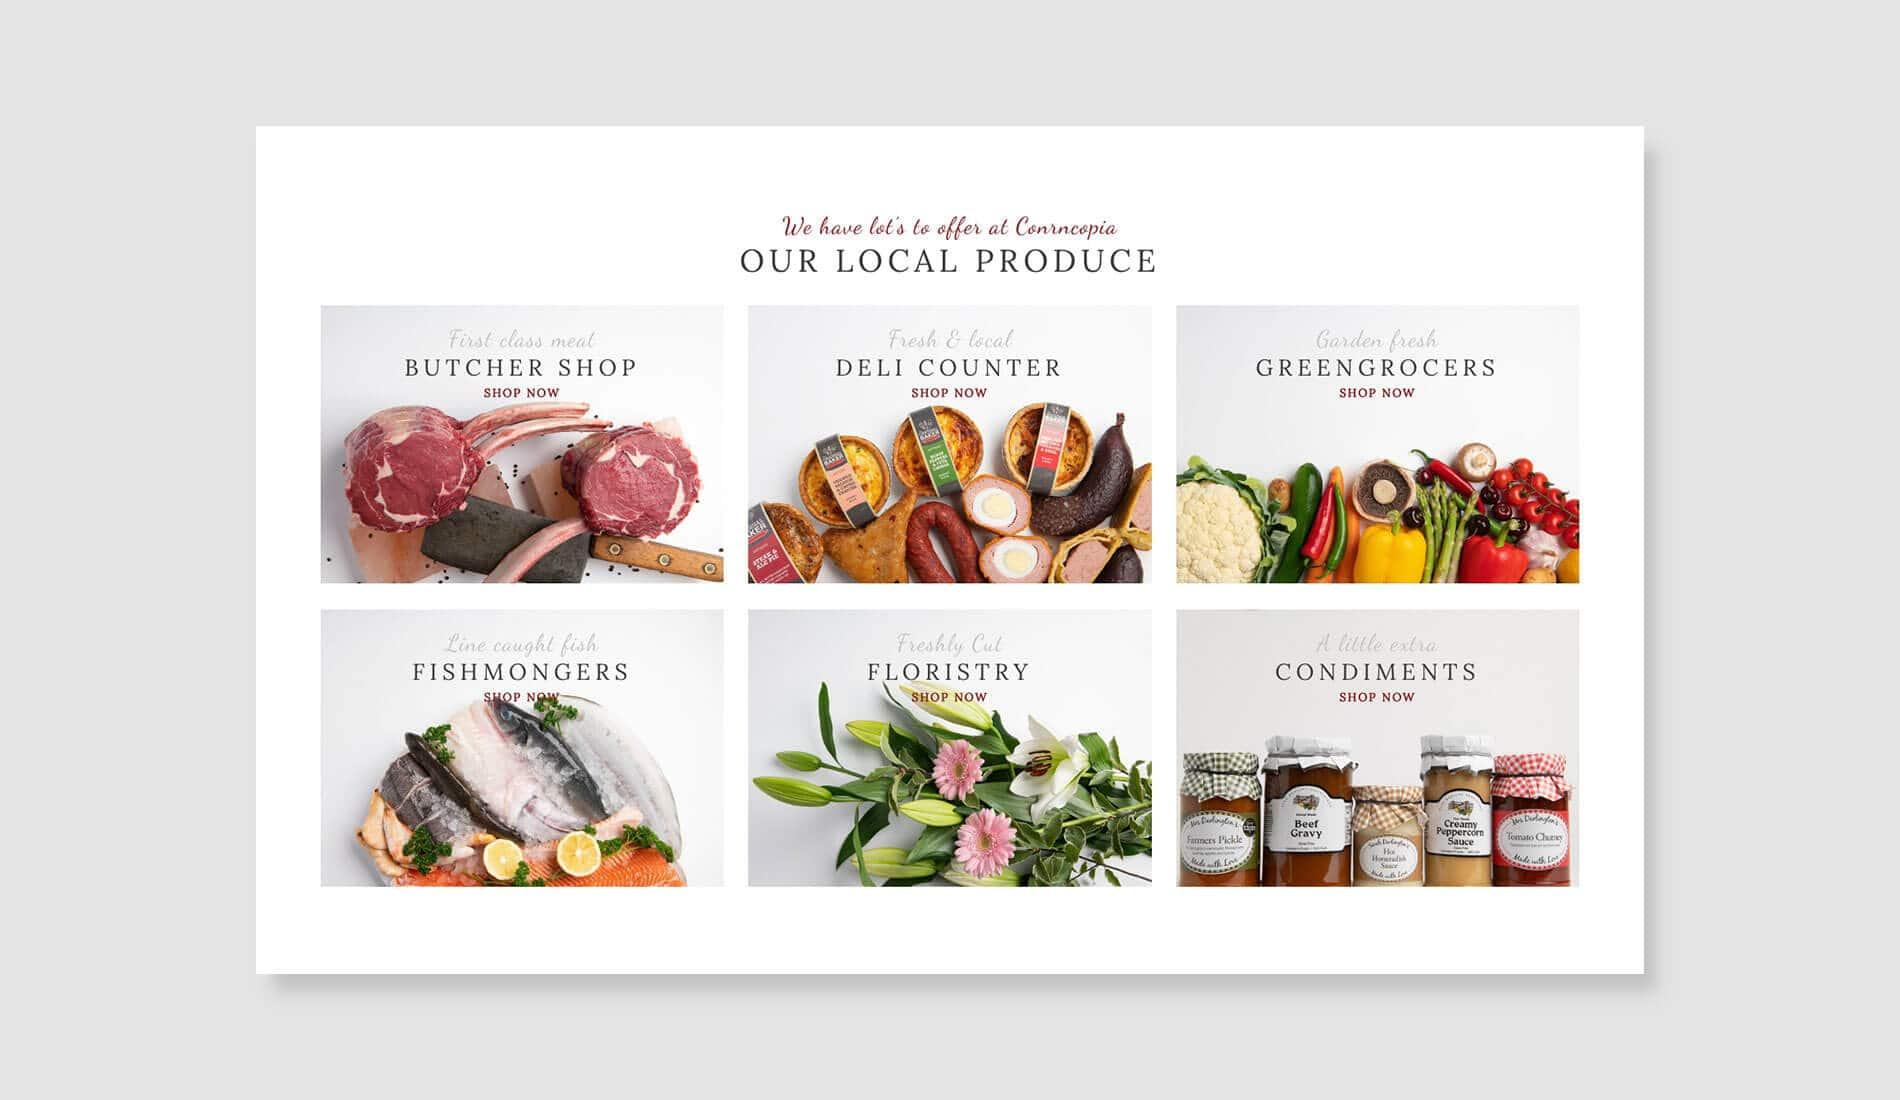 Cornucopia website design category sections on grey background